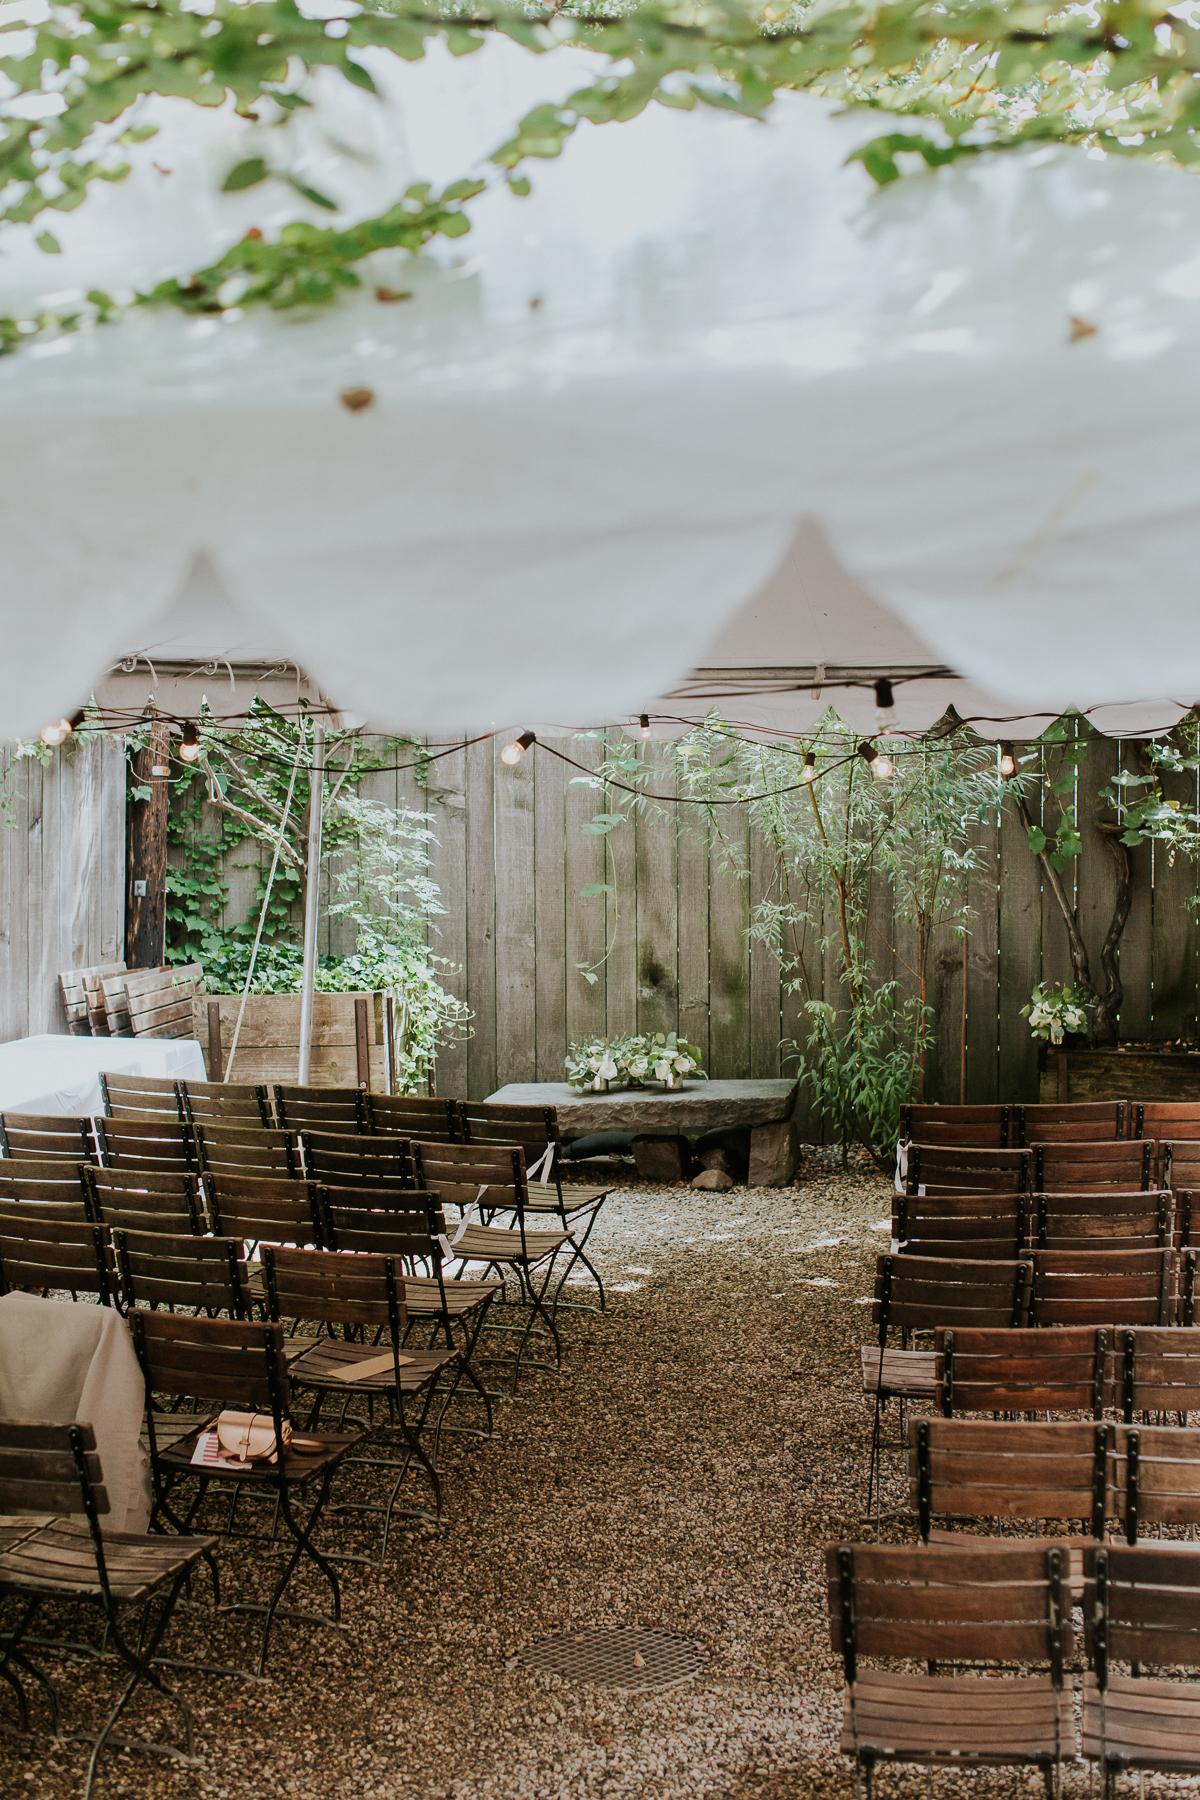 Frankies-457-Spuntino-Intimate-Brooklyn-Restaurant-Wedding-Photographer-43.jpg